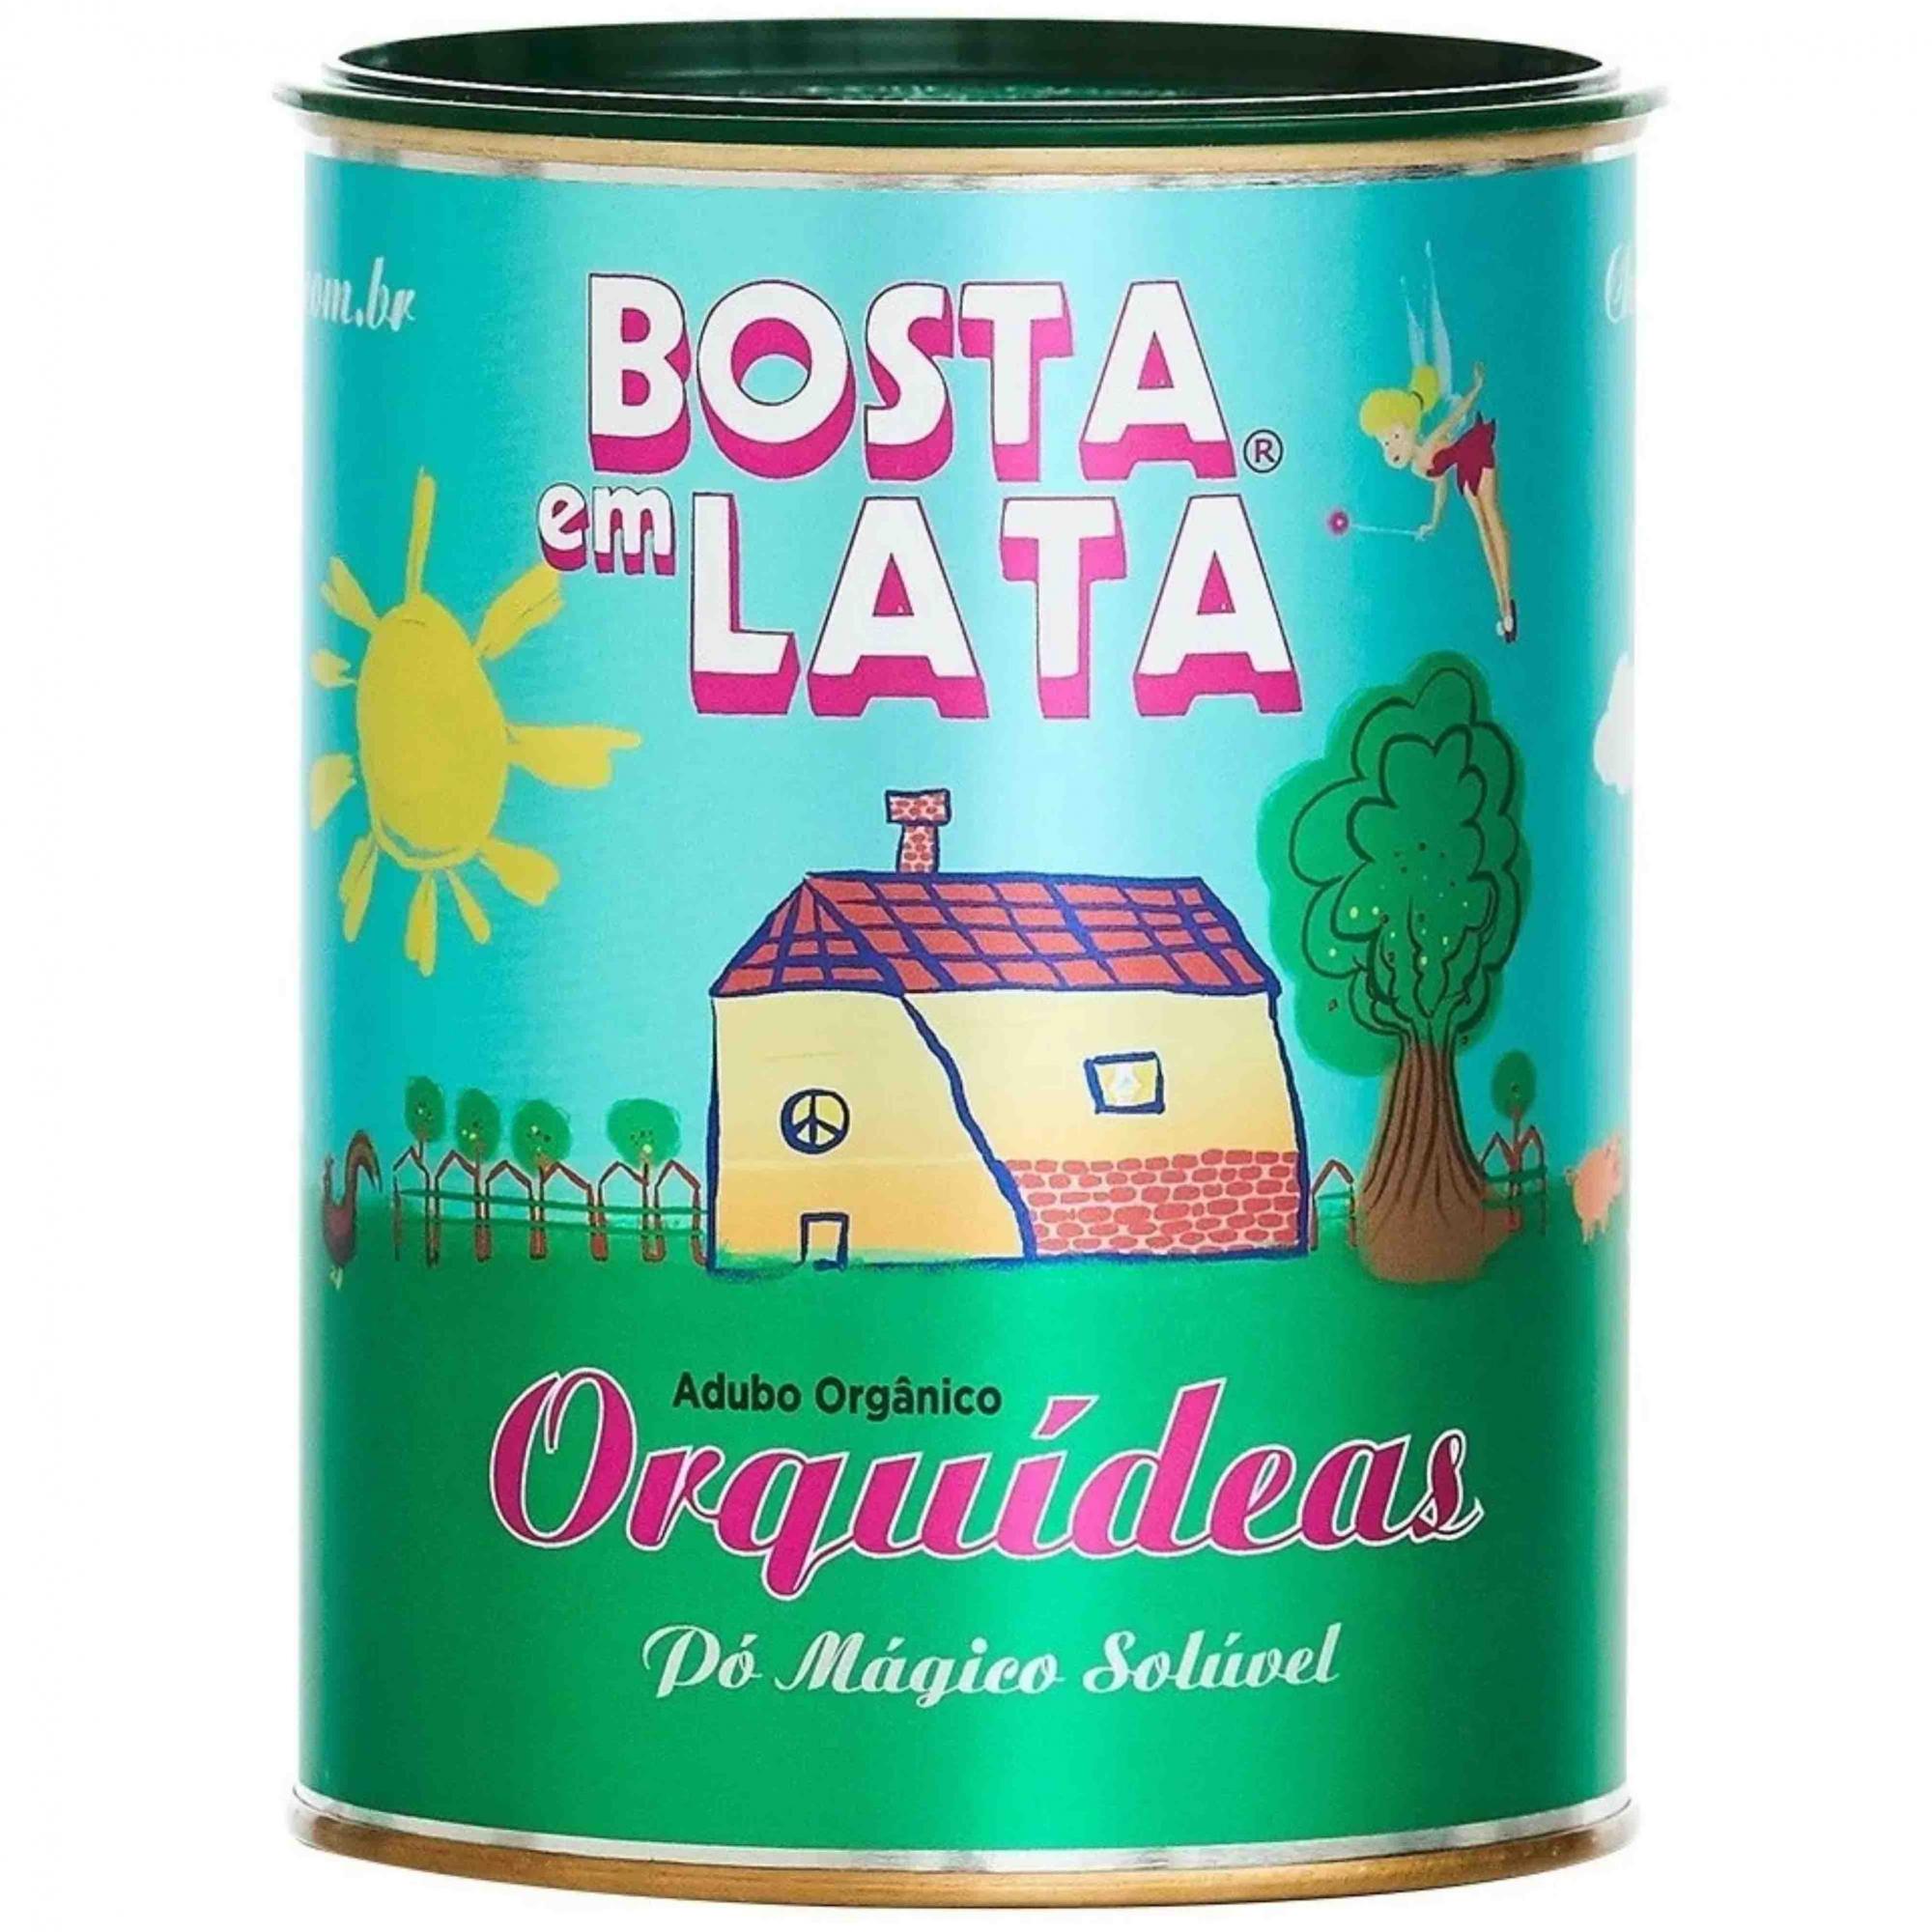 Fertilizante Organico Soluvel p/Orquideas Bosta em Lata 400g